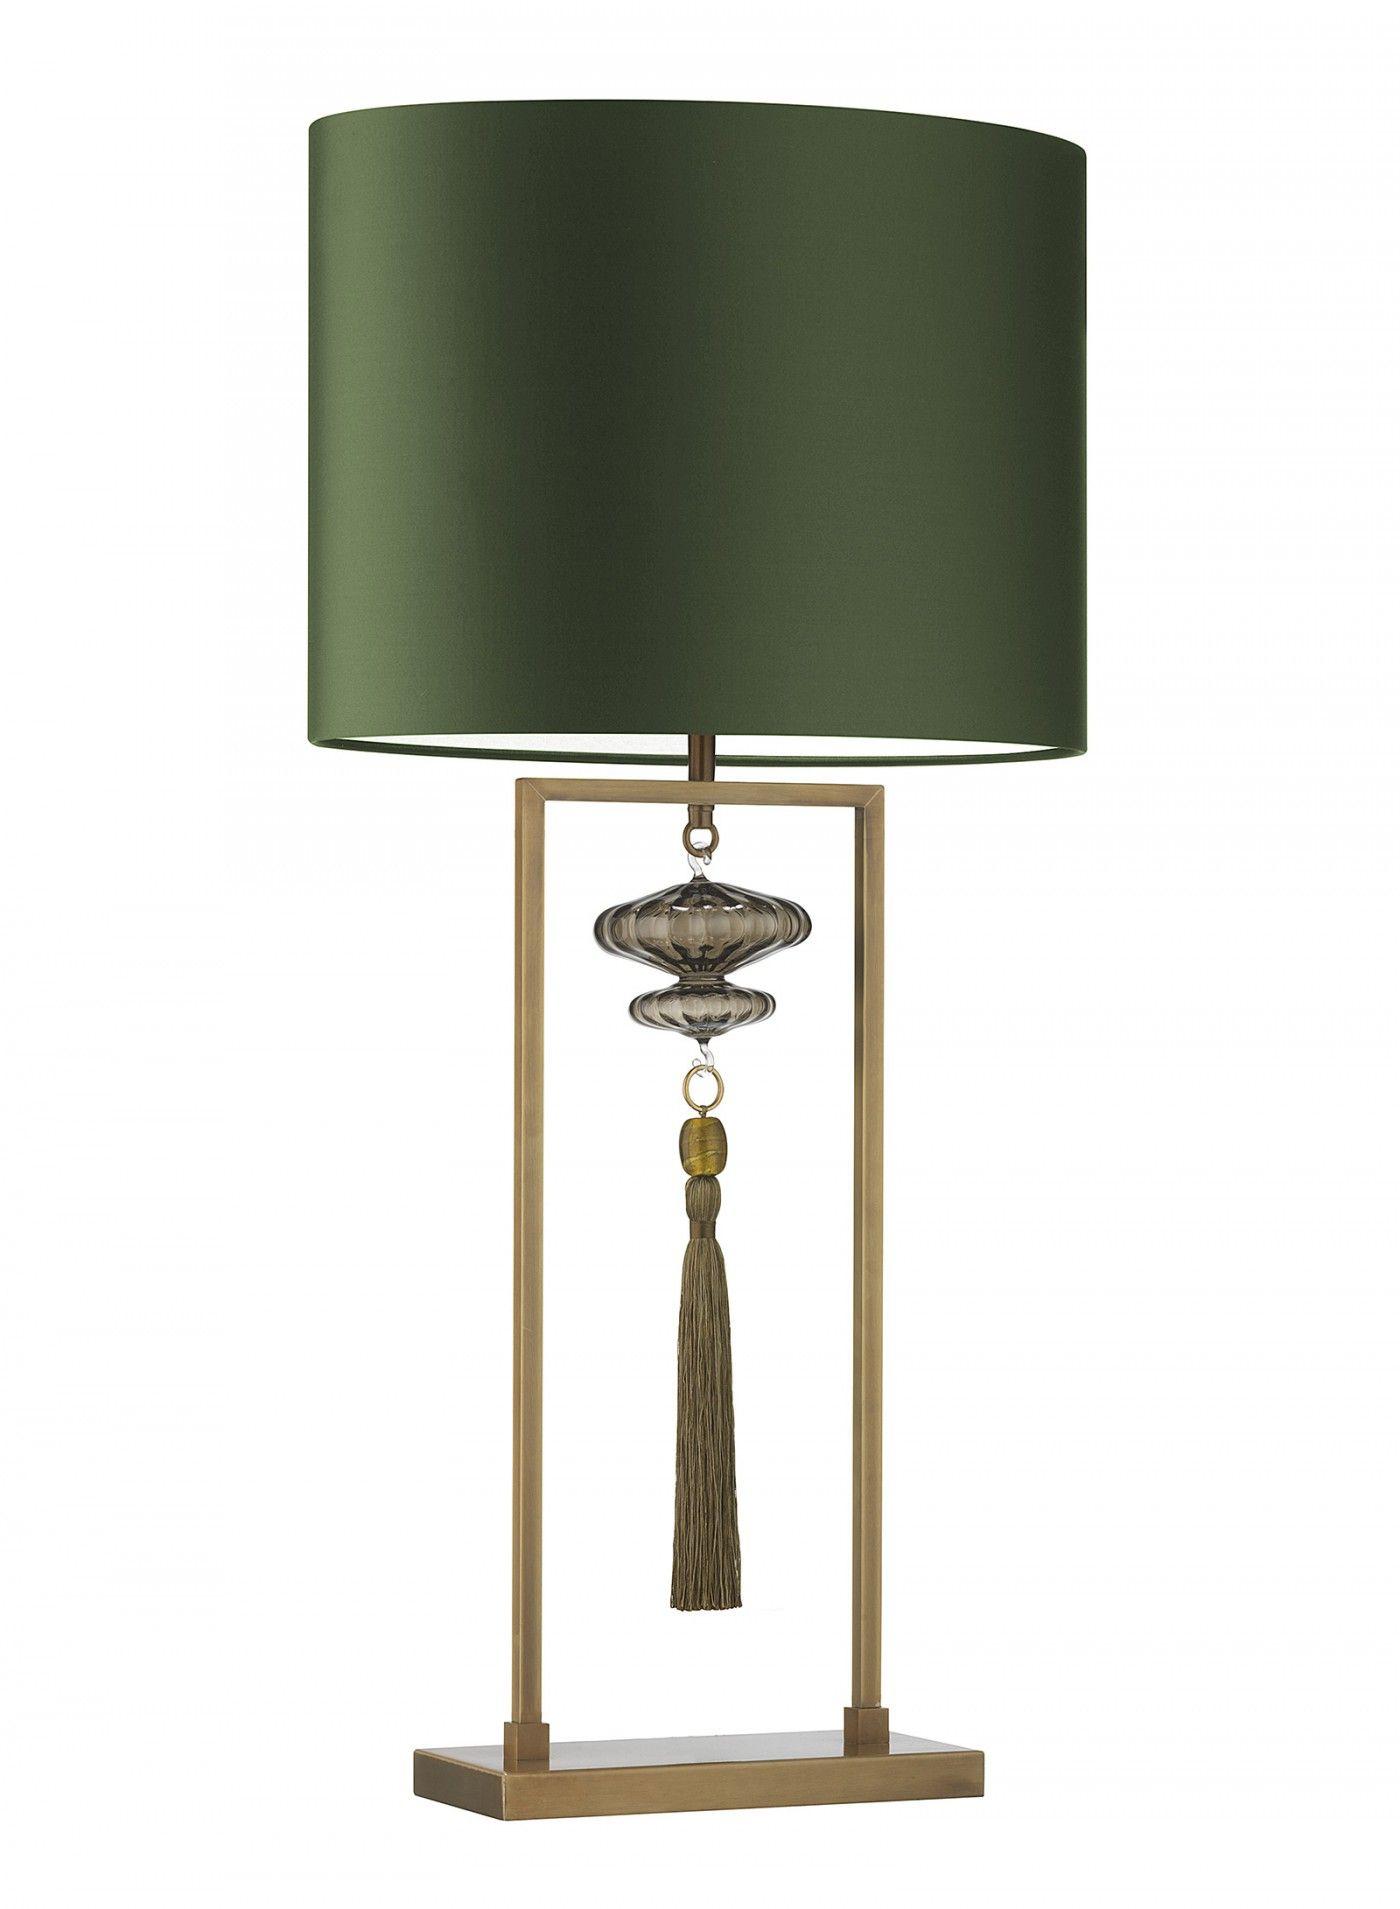 Constance Large Antique Brass Table Lamp Heathfield Co Green